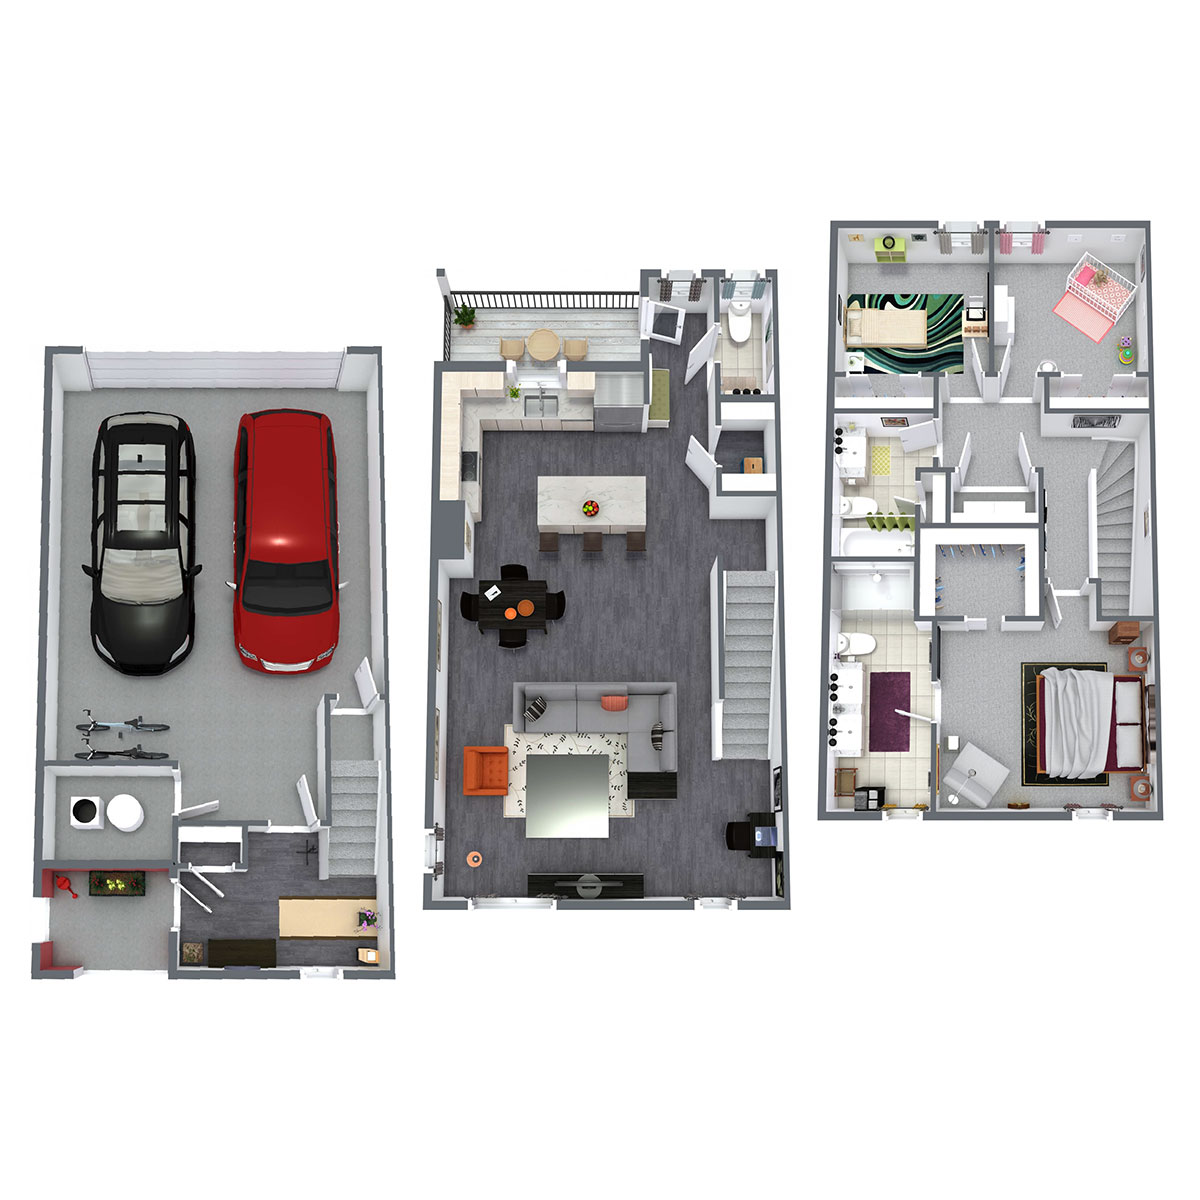 Juniper Rows at Olde Towne - Floorplan - Juniper - 3 Bedroom